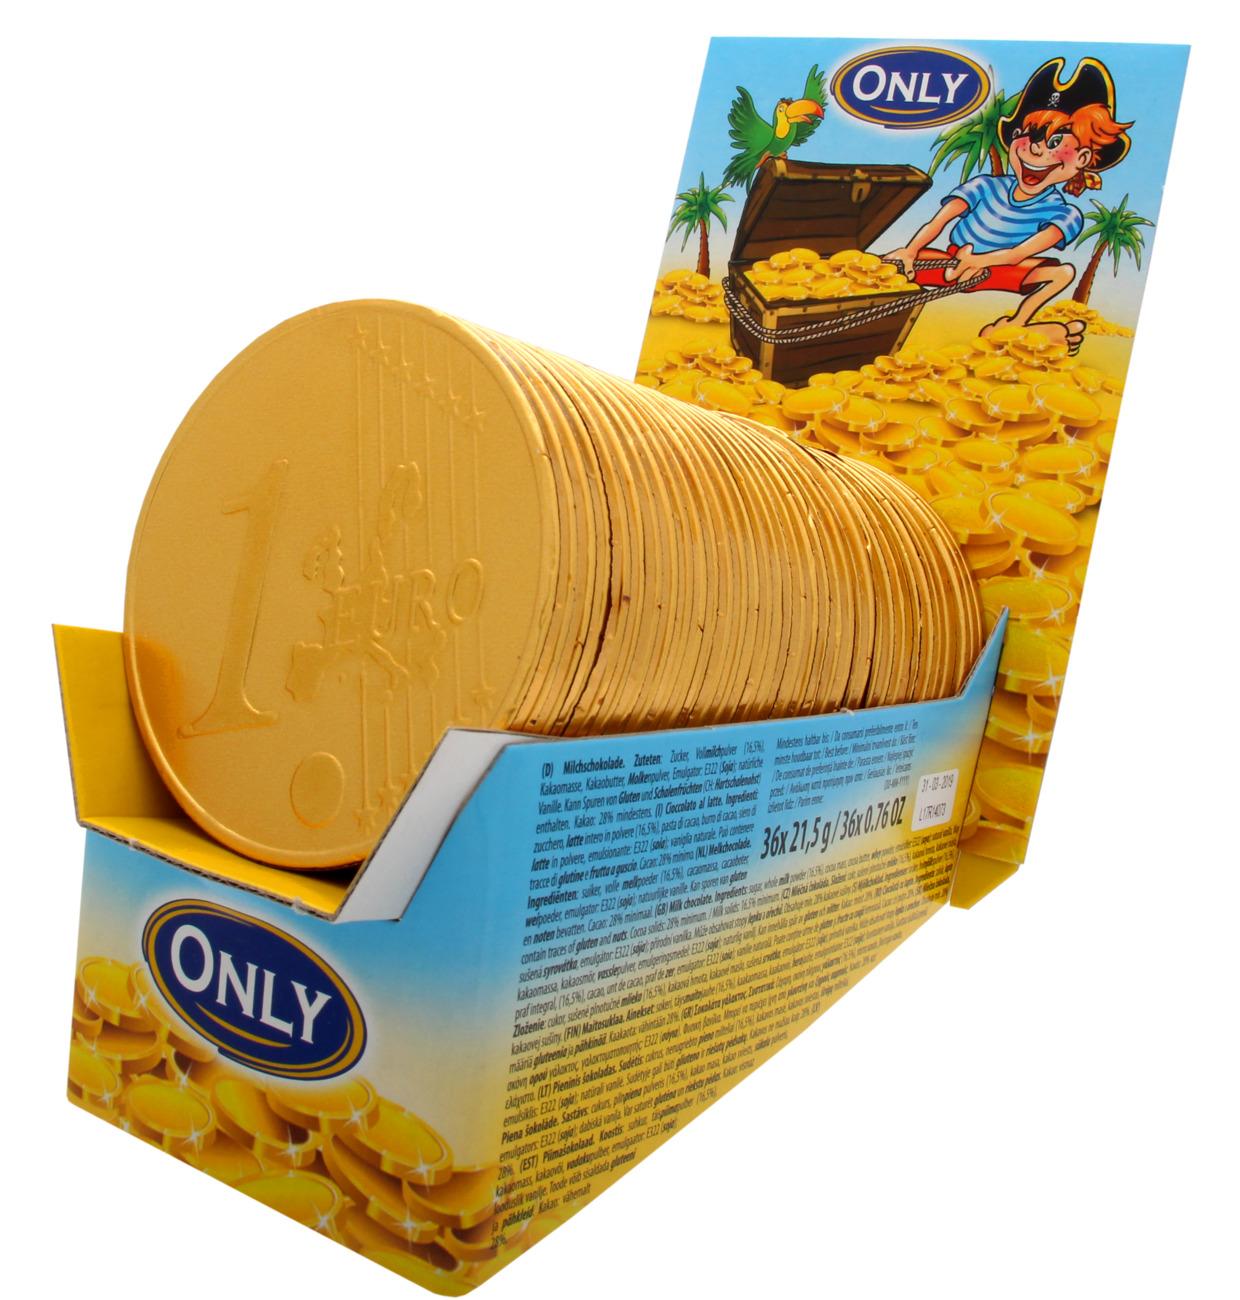 DISPLAY Riesengoldmünzen Milchschokolade Thekendisplay